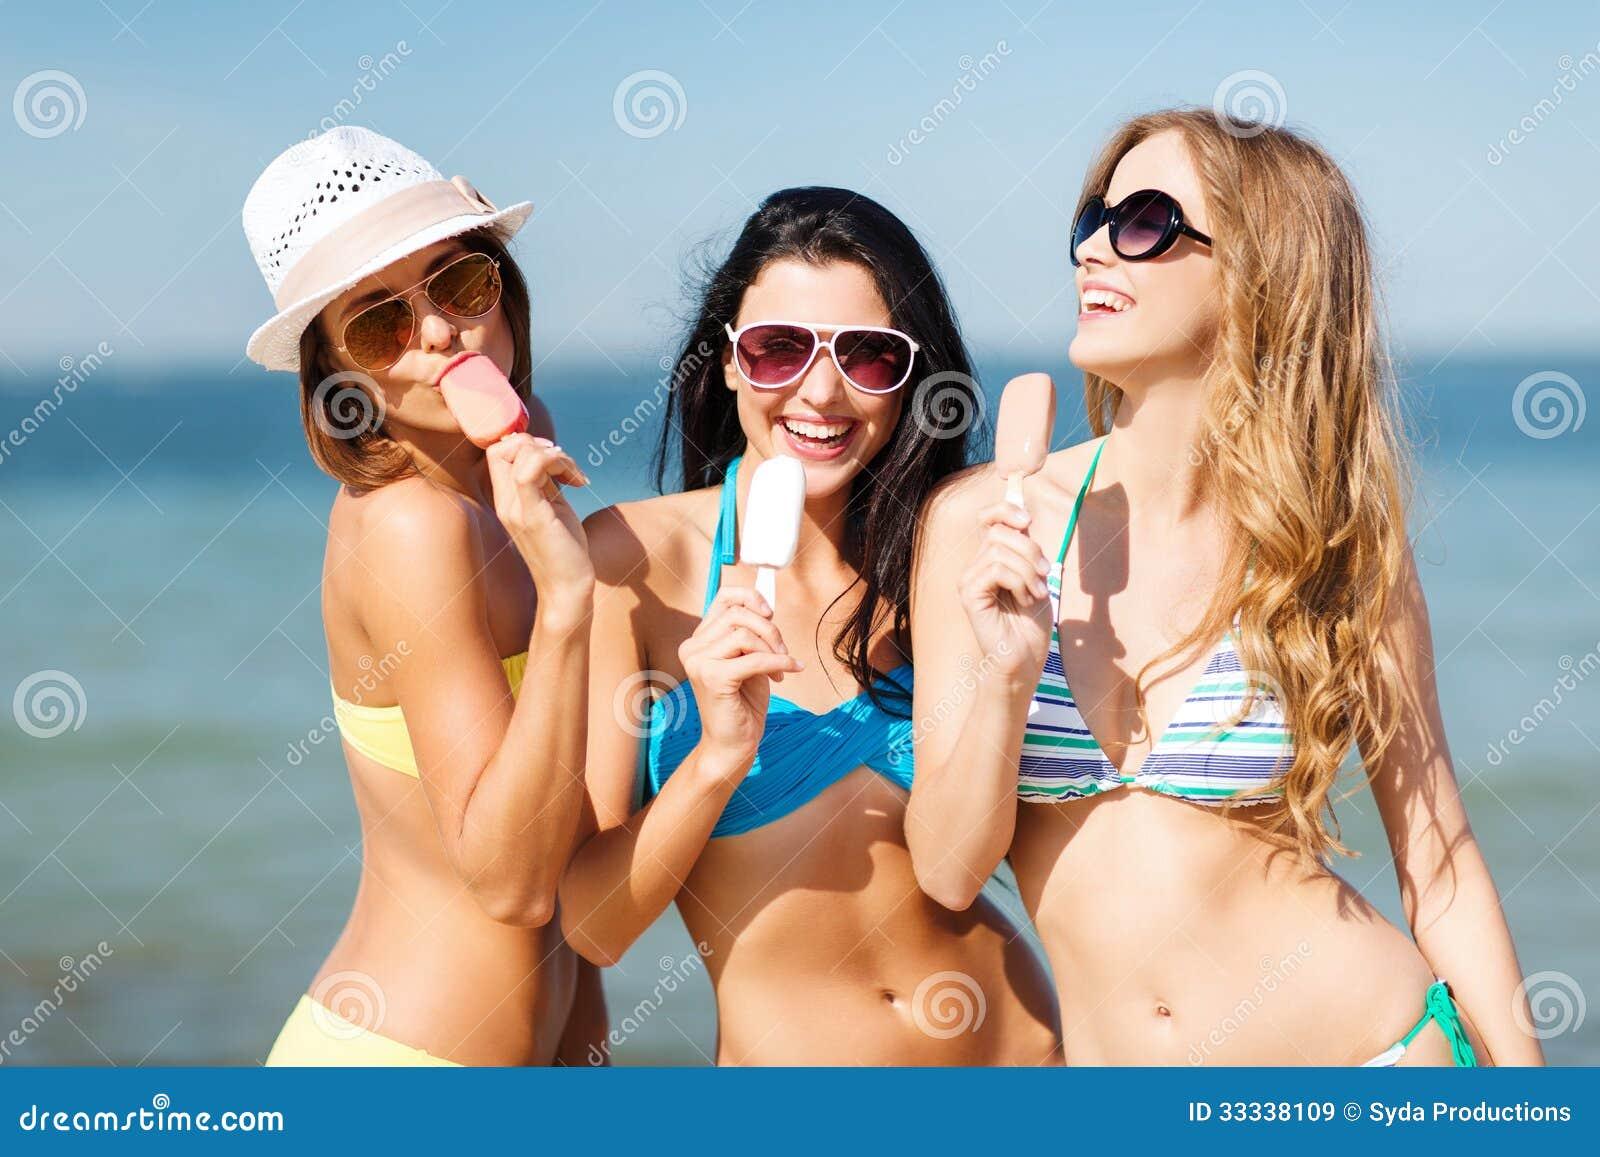 Meninas em odessa nude